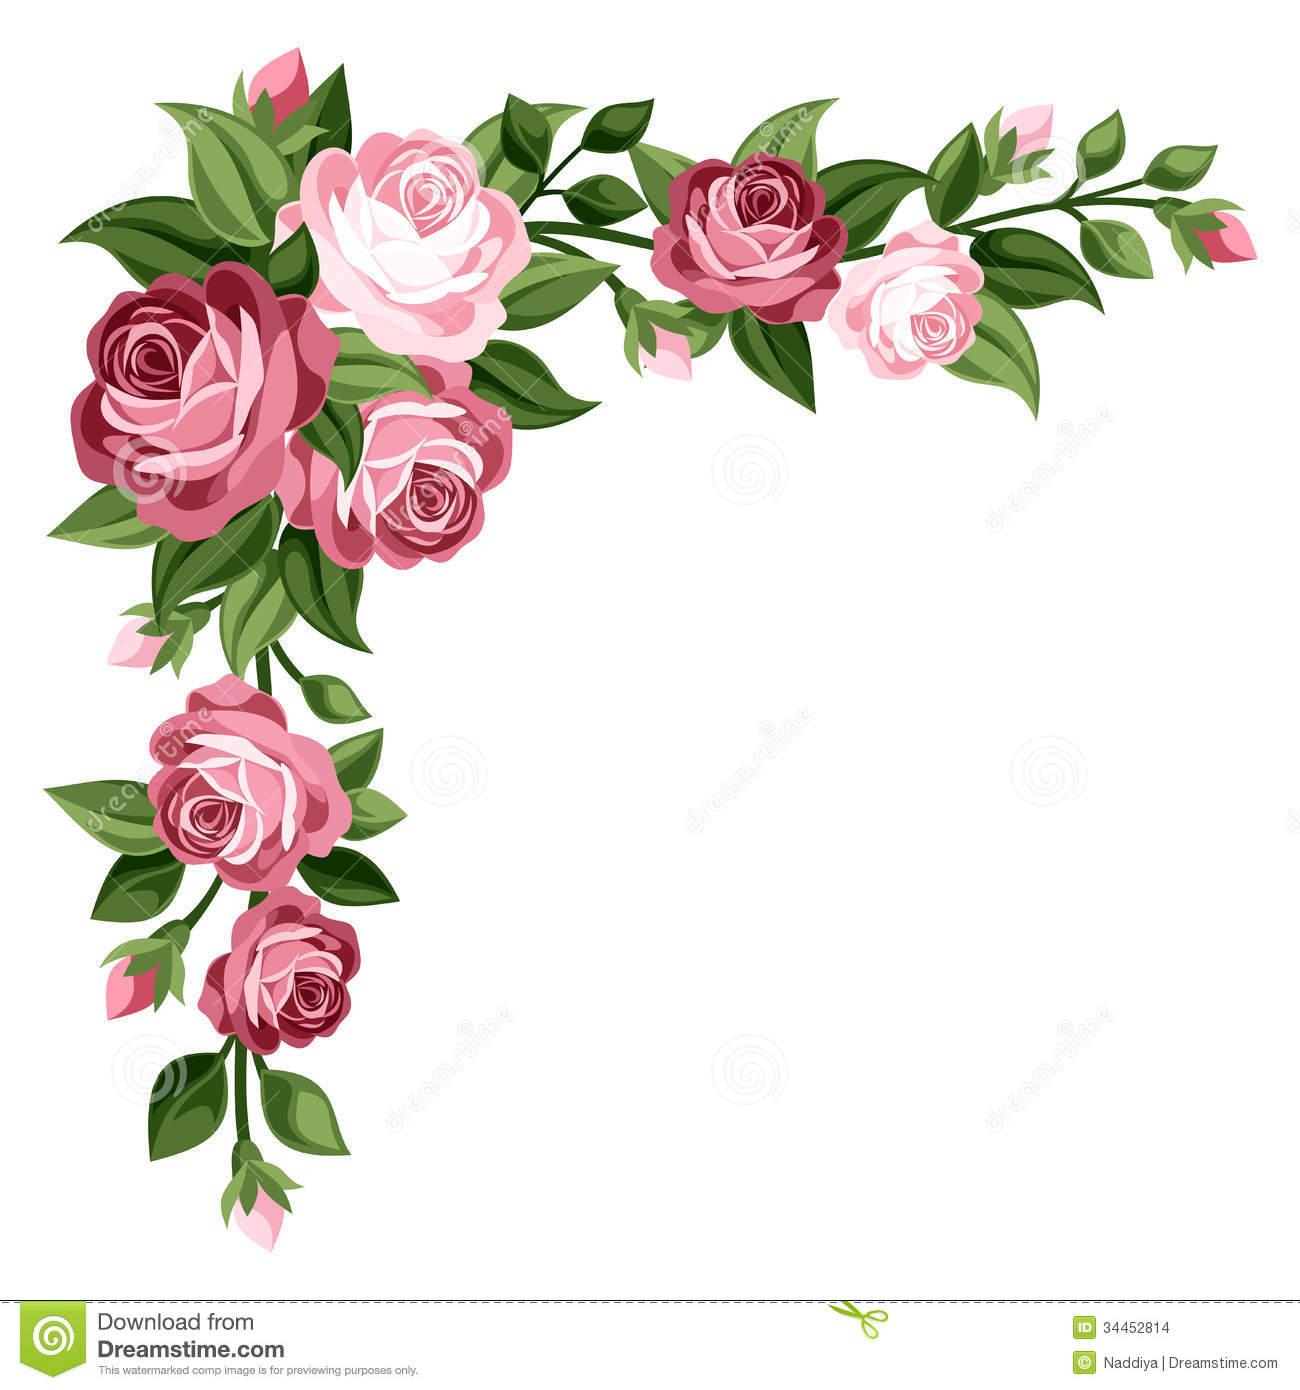 pink vintage roses rosebuds leaves corner rose buds green isolated 1300x1390